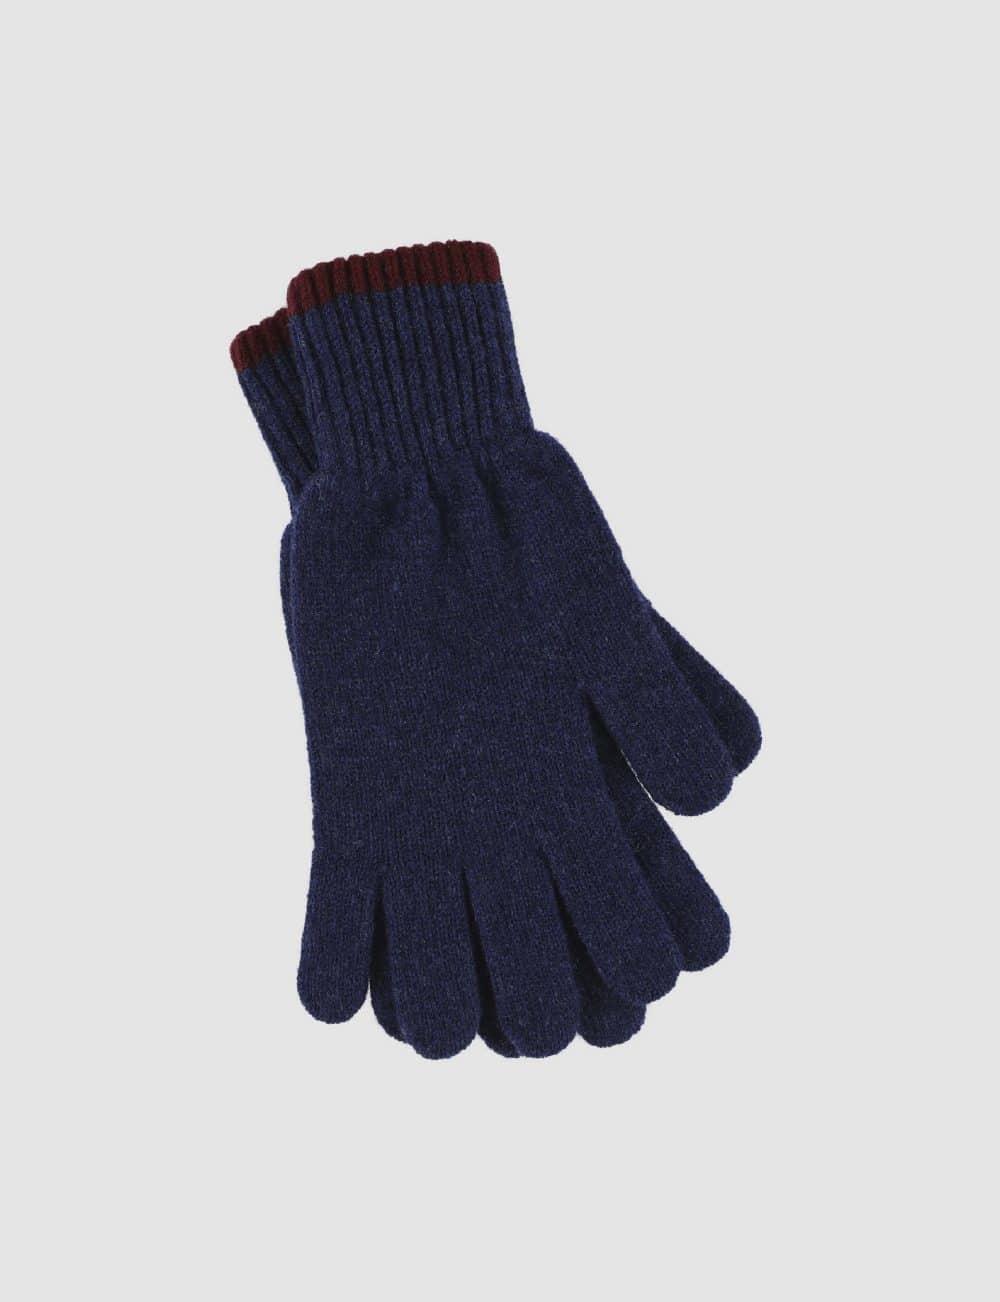 Gloves - Navy Blue